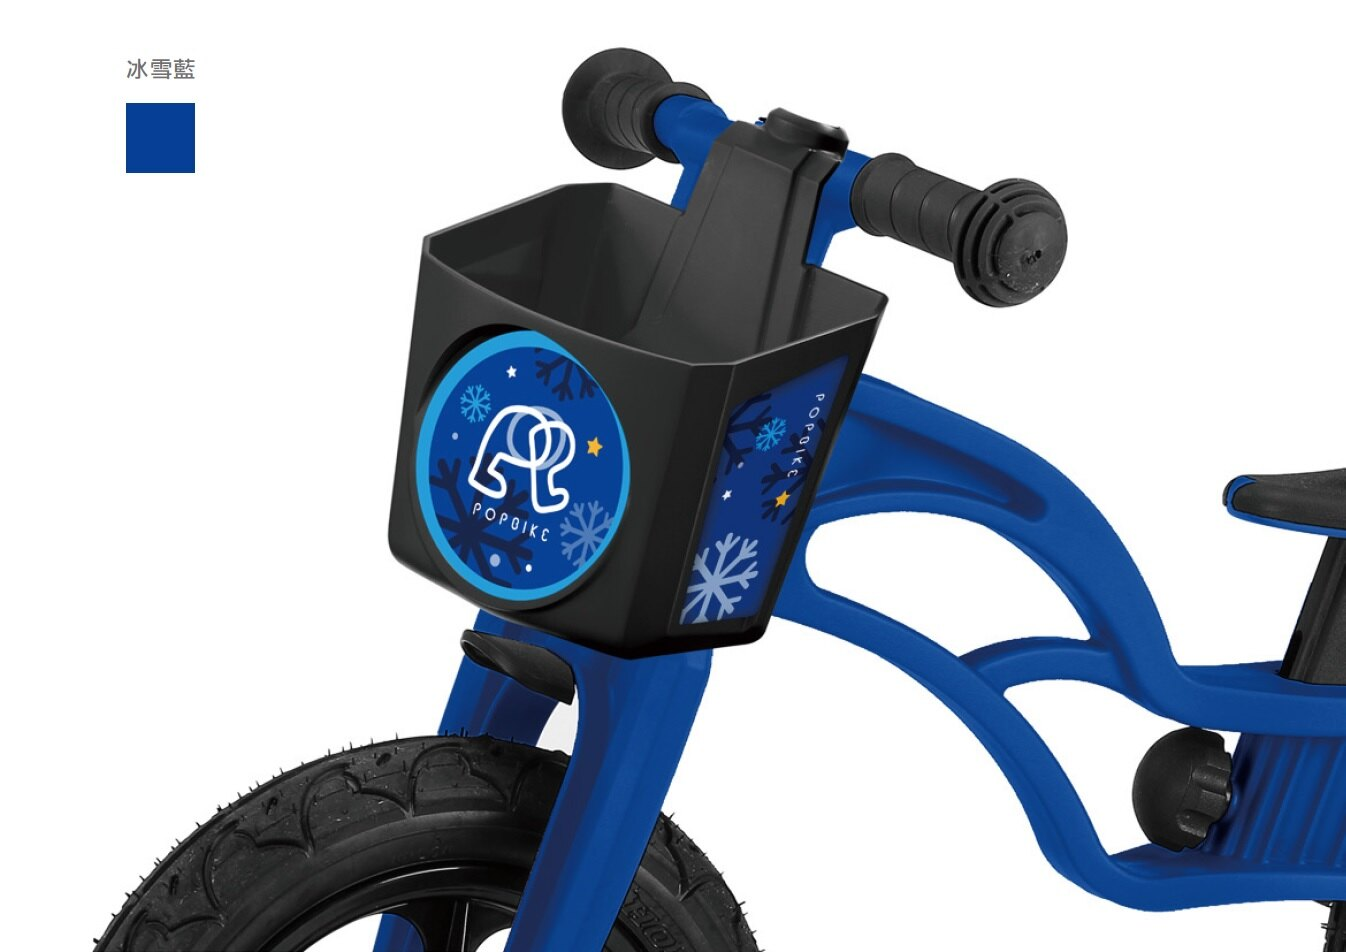 POPBIKE 車籃 (冰雪藍) - 限時優惠好康折扣